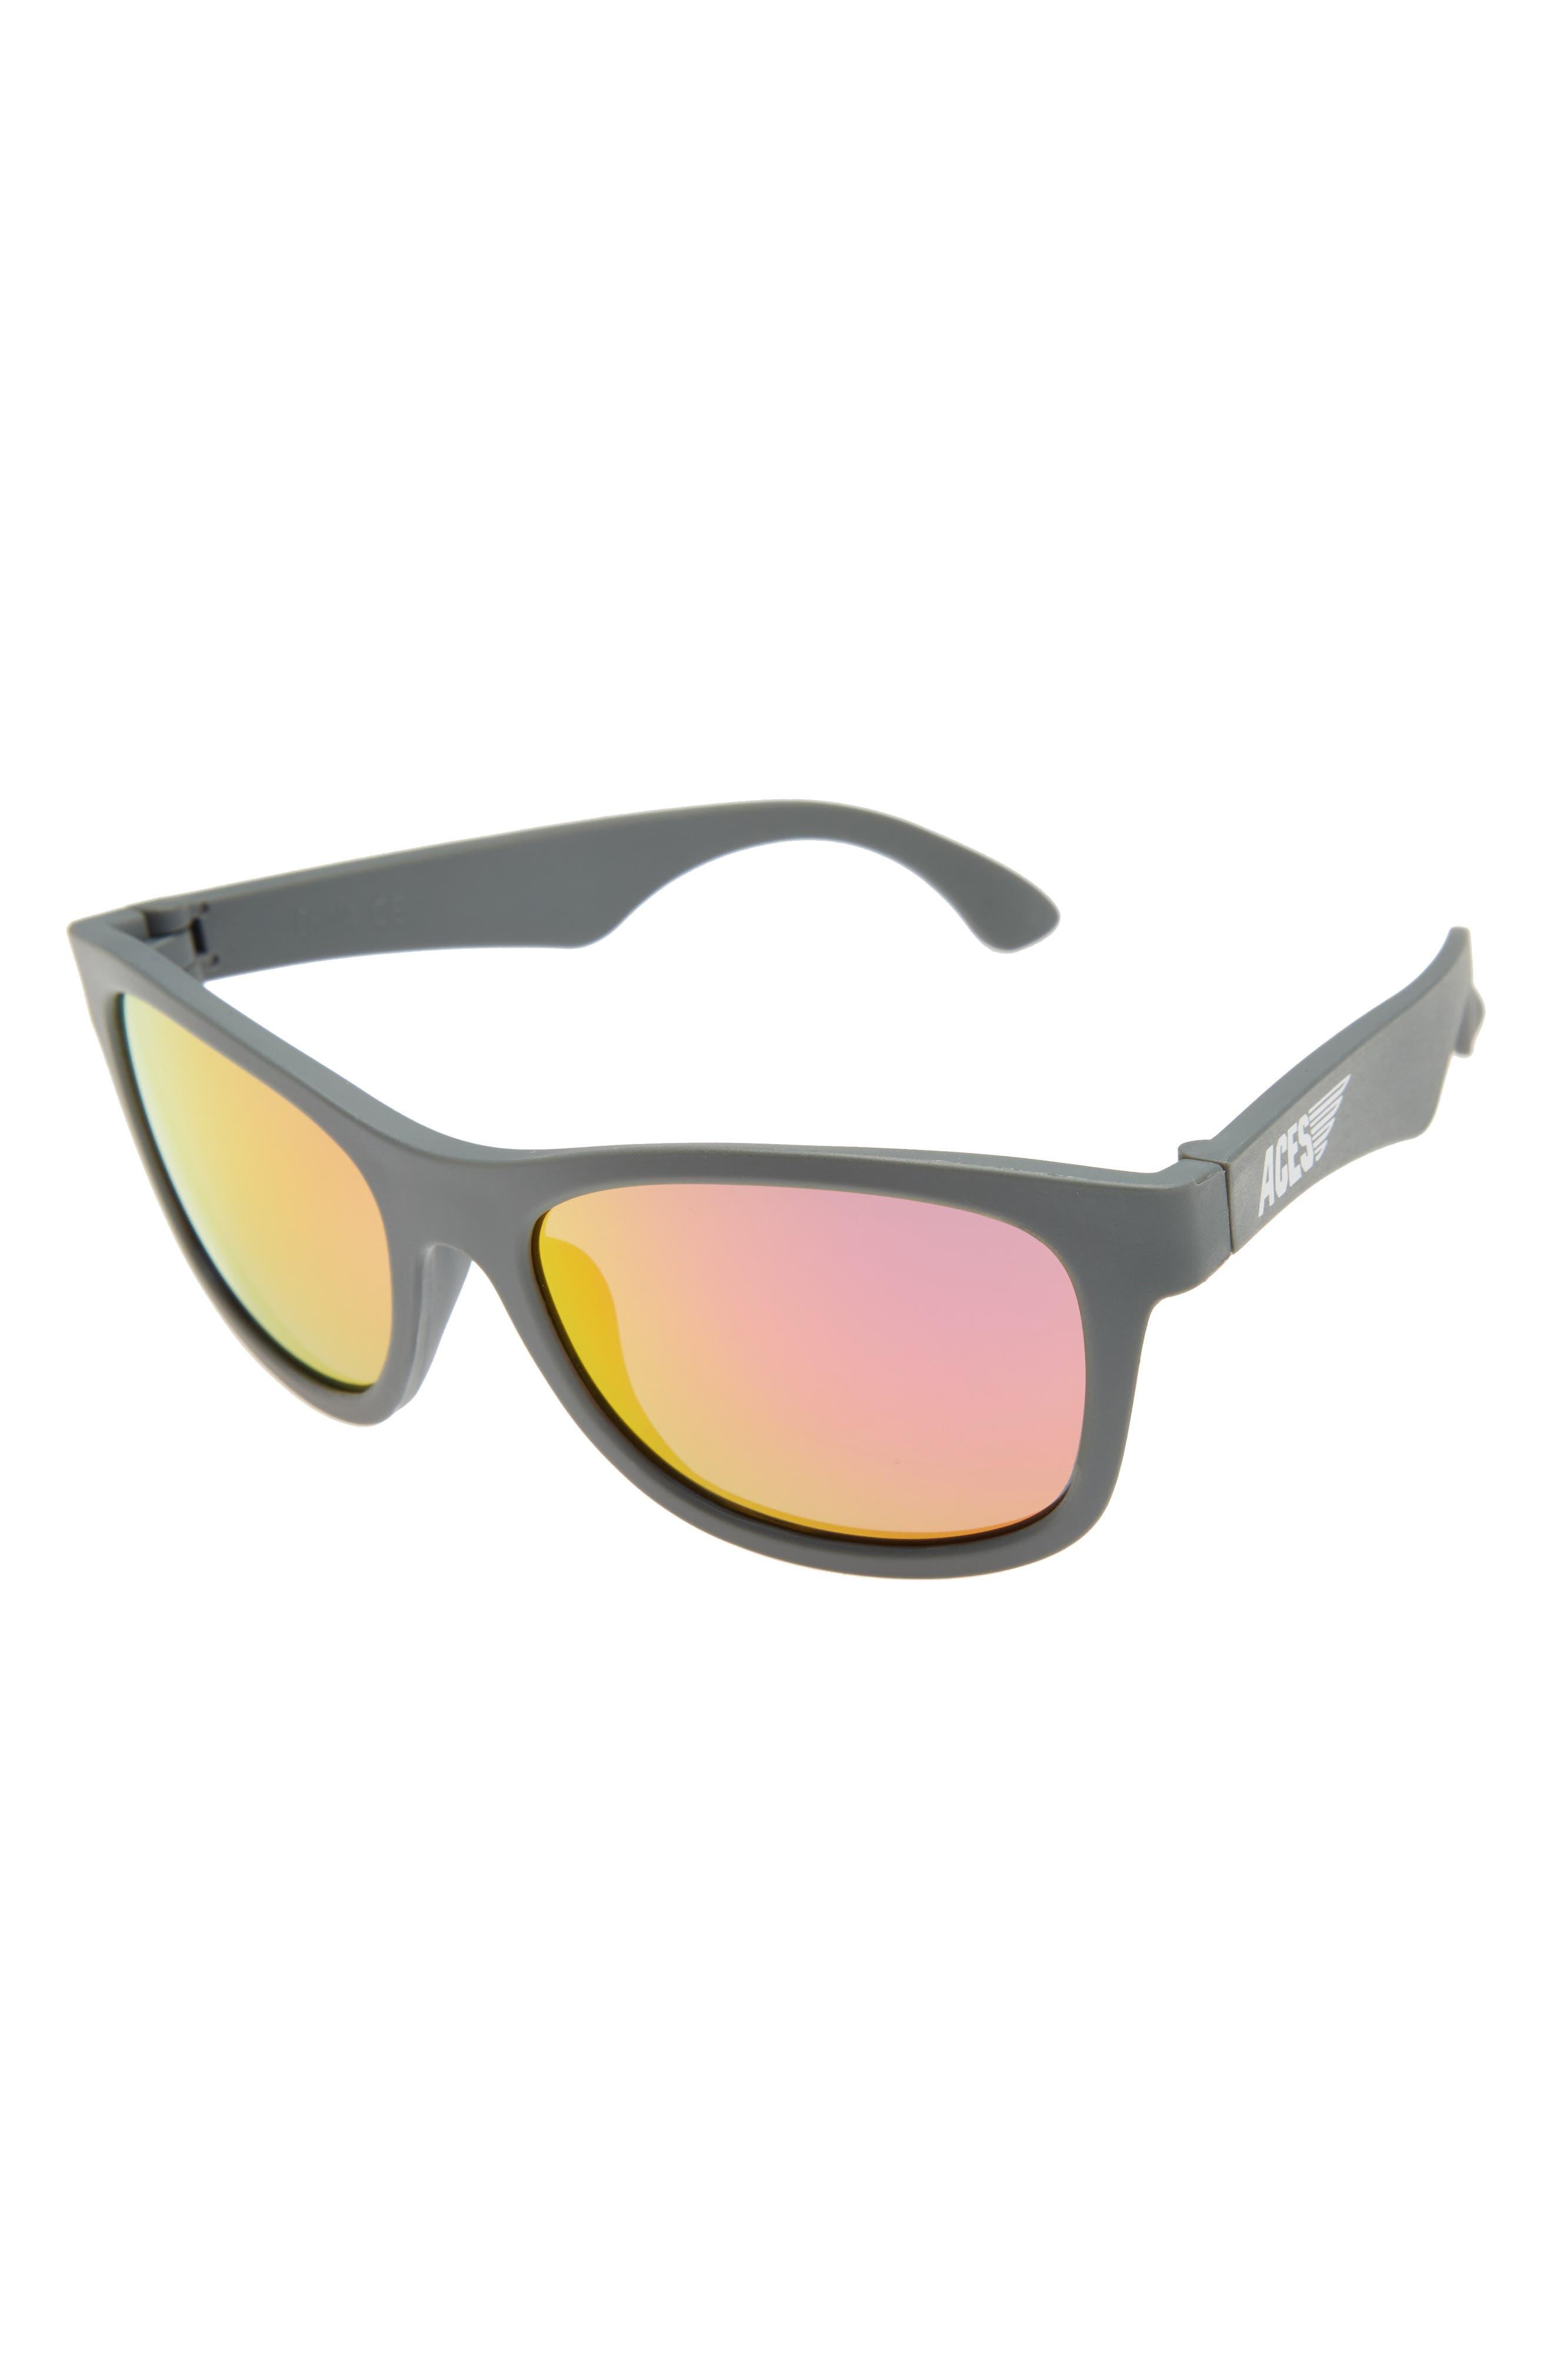 Aces Navigator Sunglasses,                             Main thumbnail 1, color,                             020